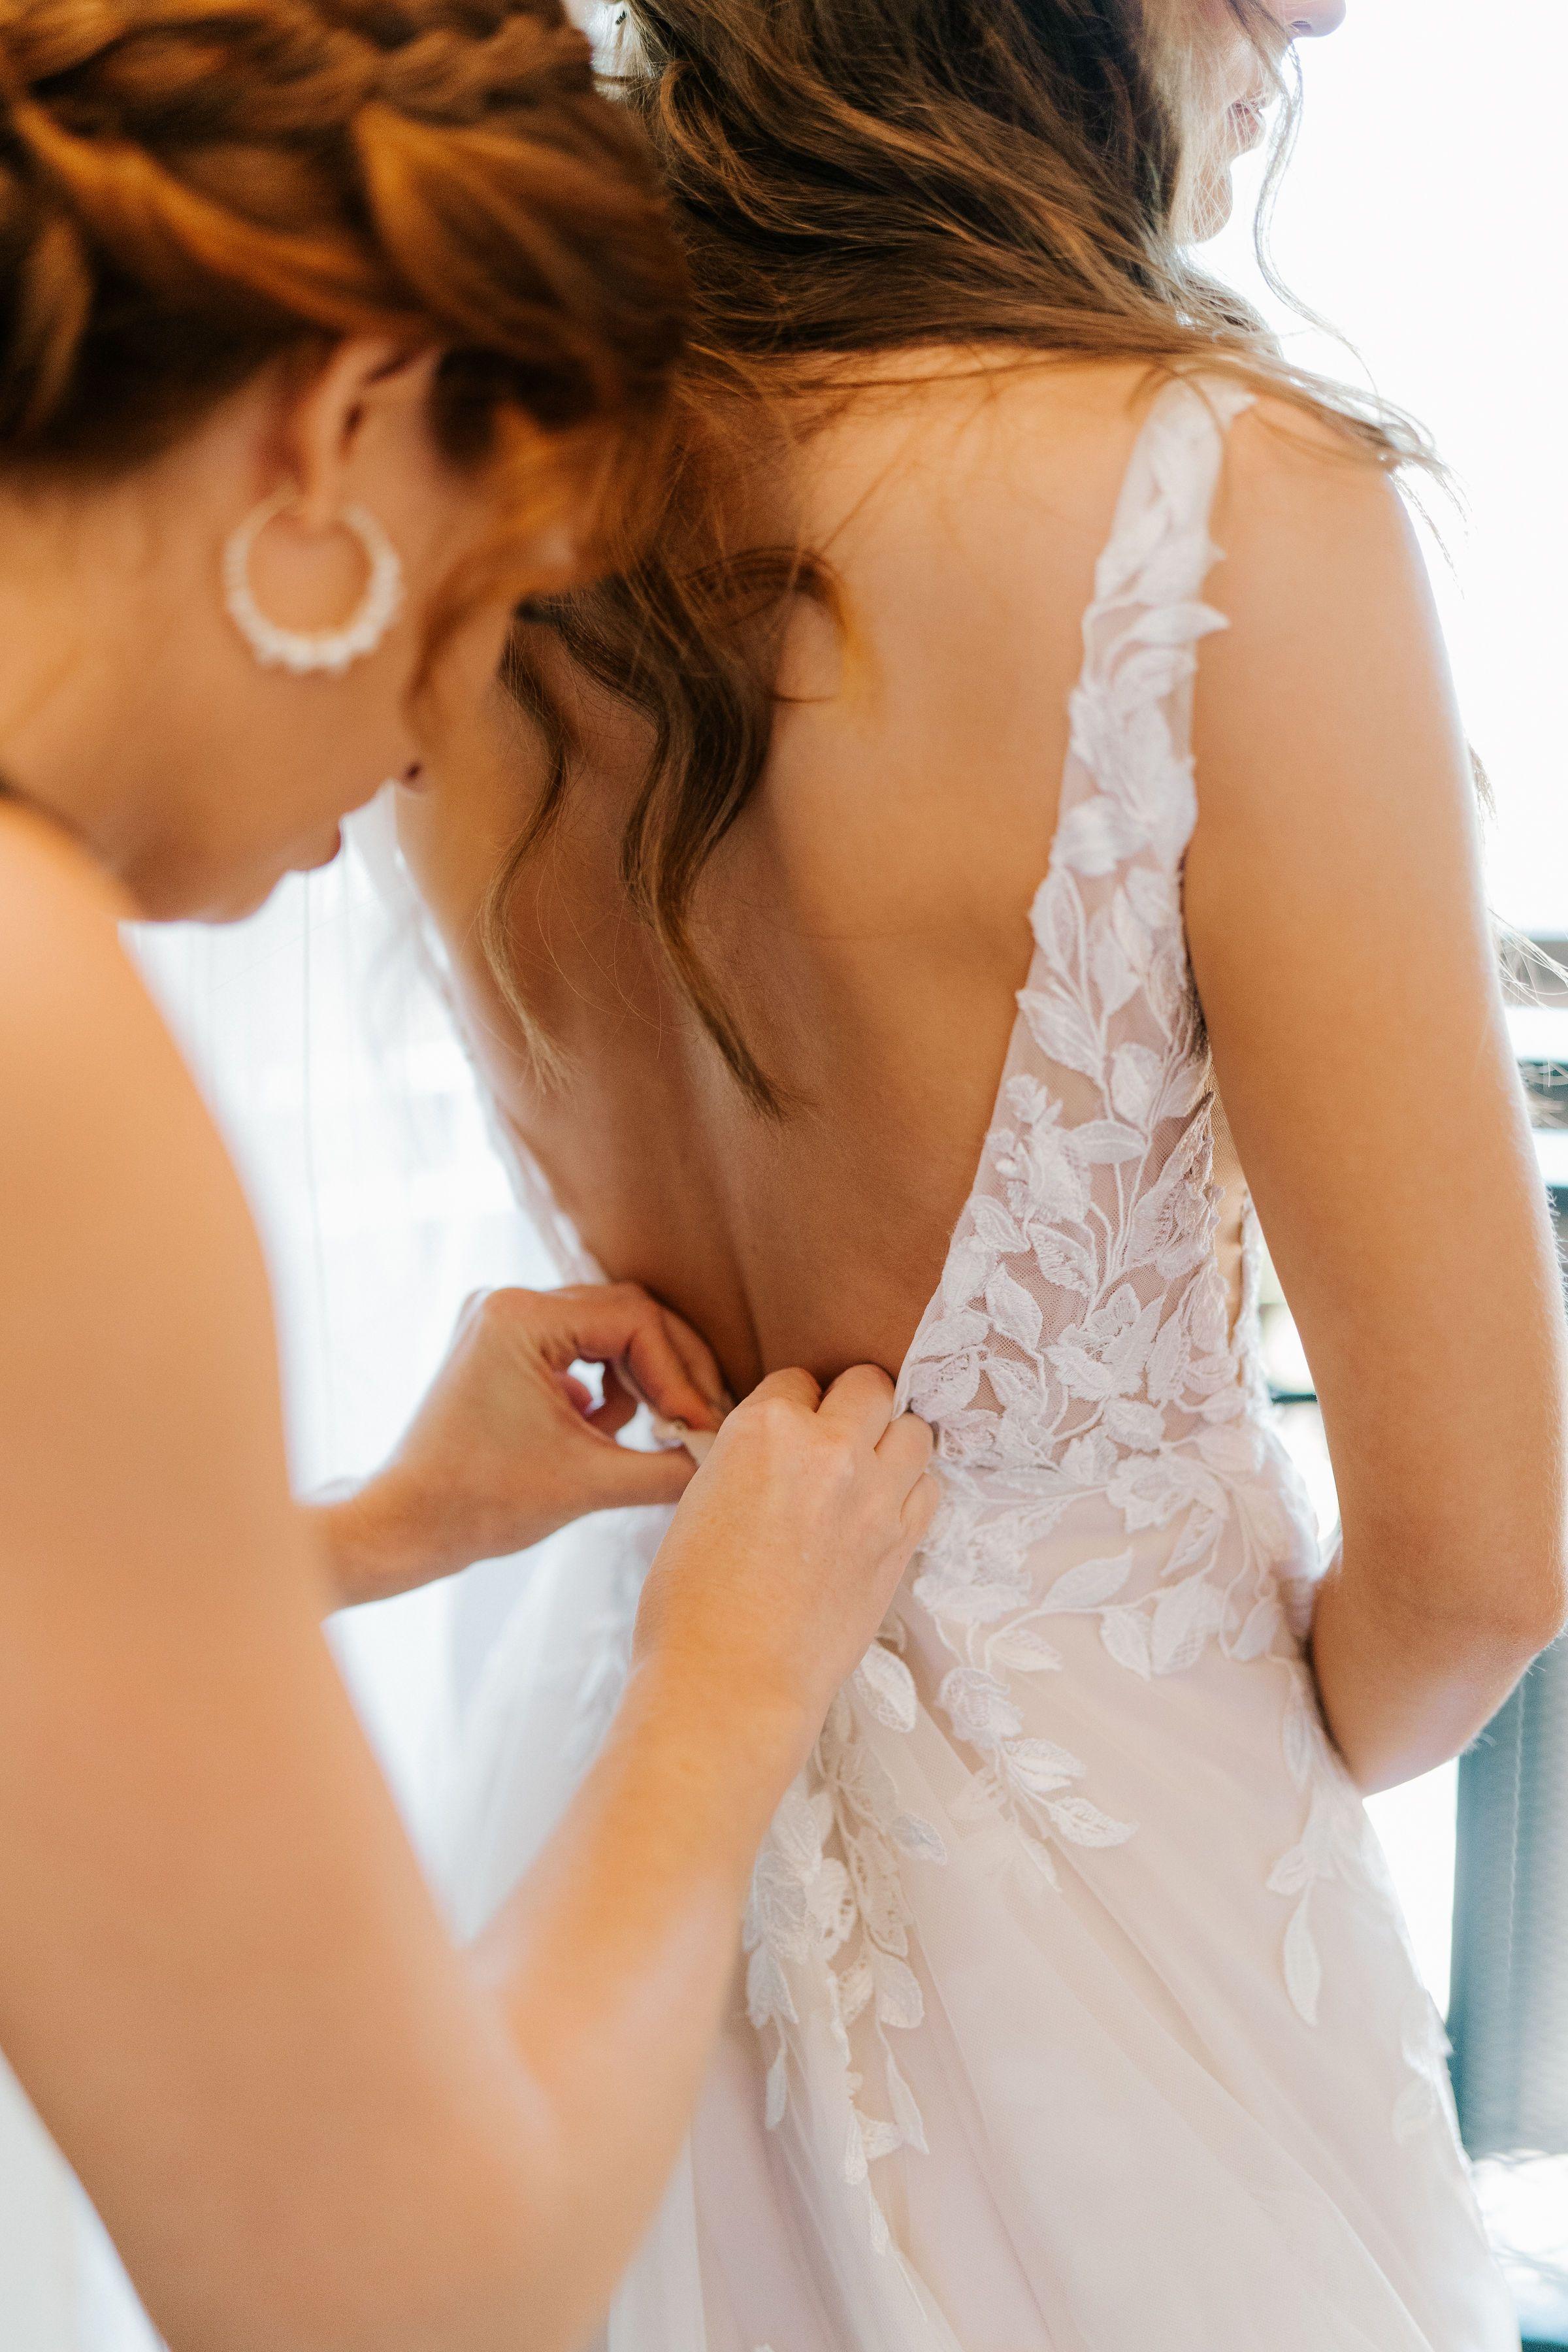 A friend helps a bride into her Essense of Australia wedding dress adorned with leafy appliques.